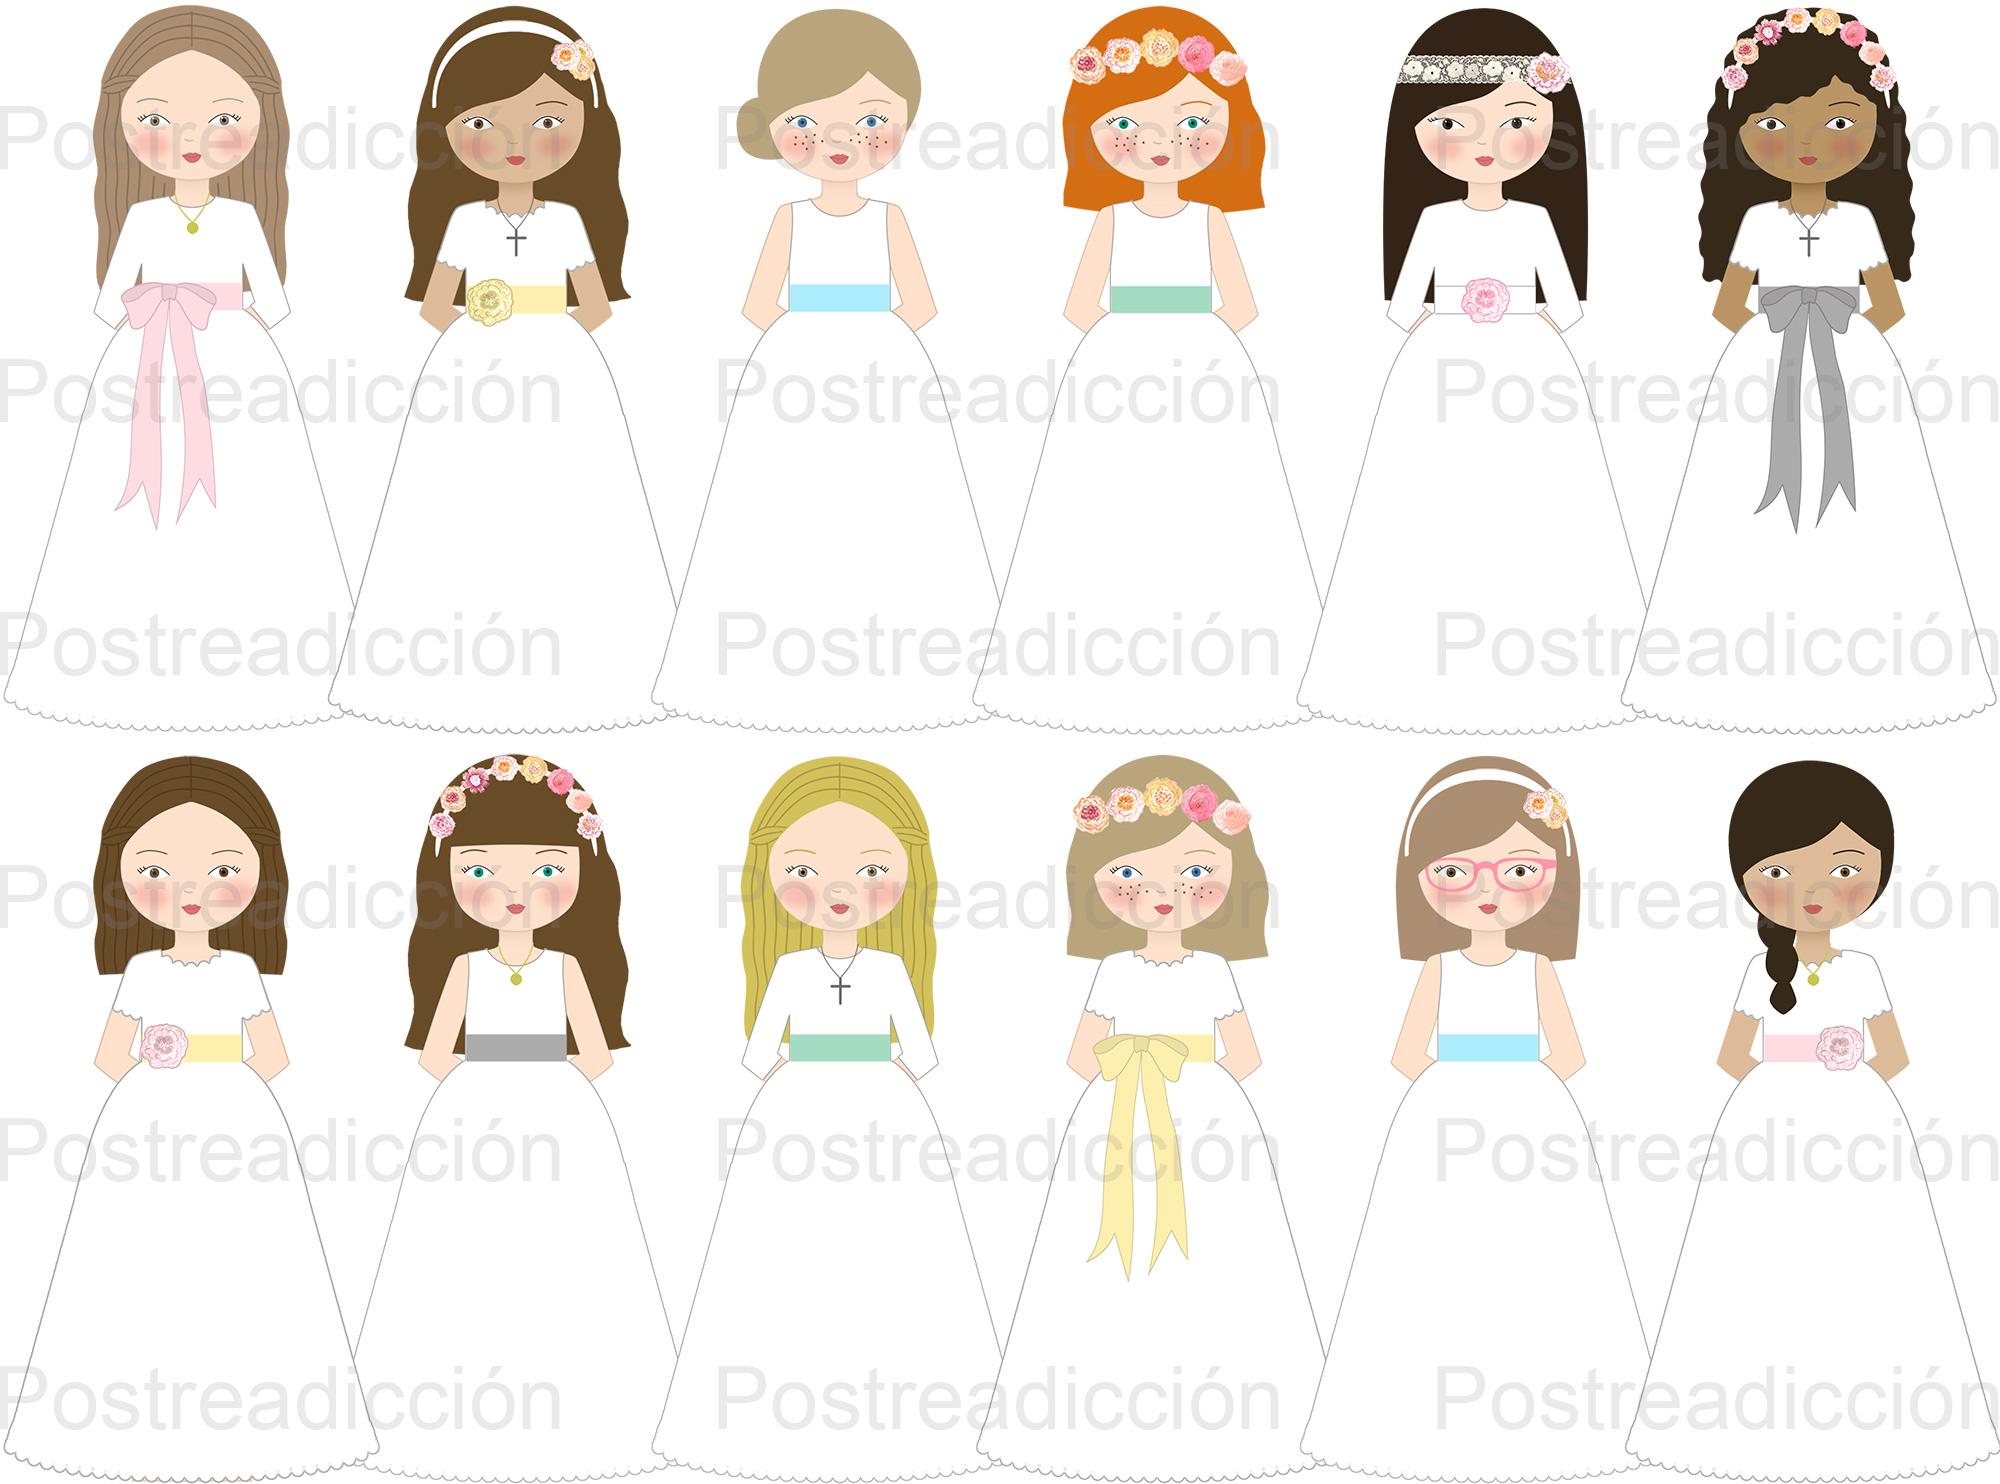 Imagen de producto: https://tienda.postreadiccion.com/img/articulos/secundarias7435-modelo-no-849-nina-de-comunion-carlota-1.jpg